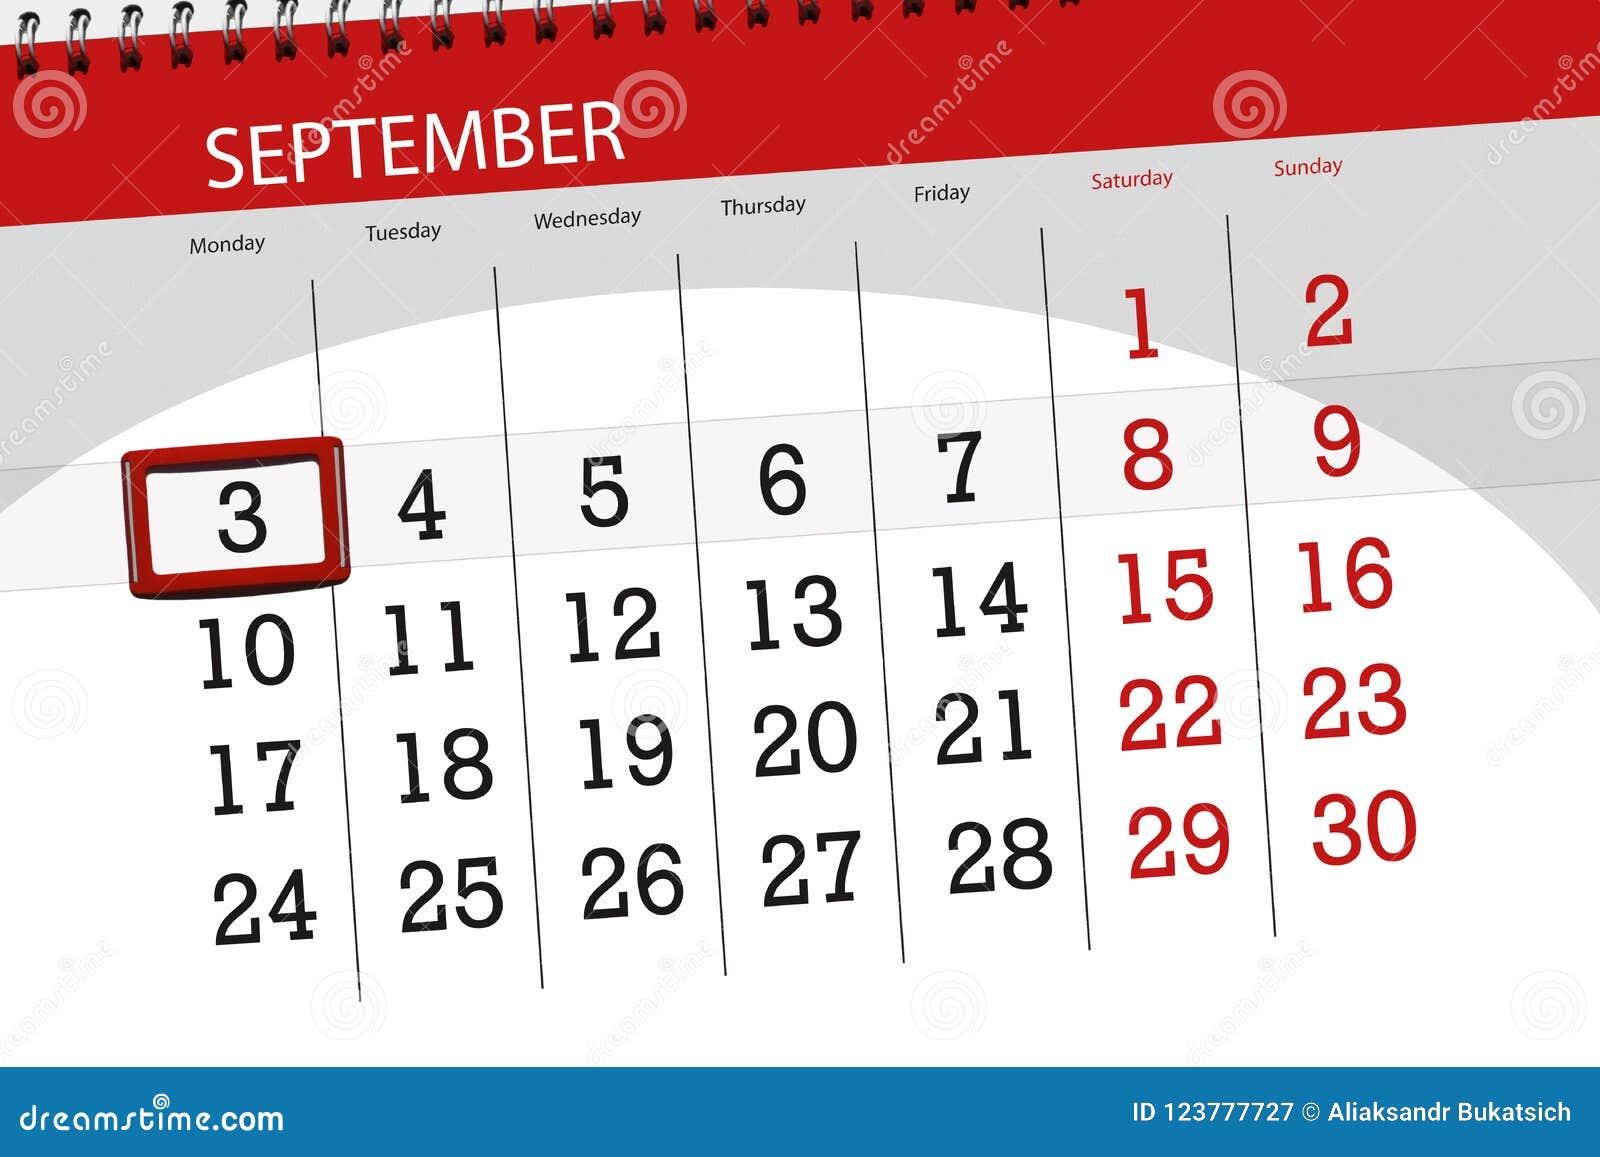 calendar planner for the month deadline day of the week 2018 september 3